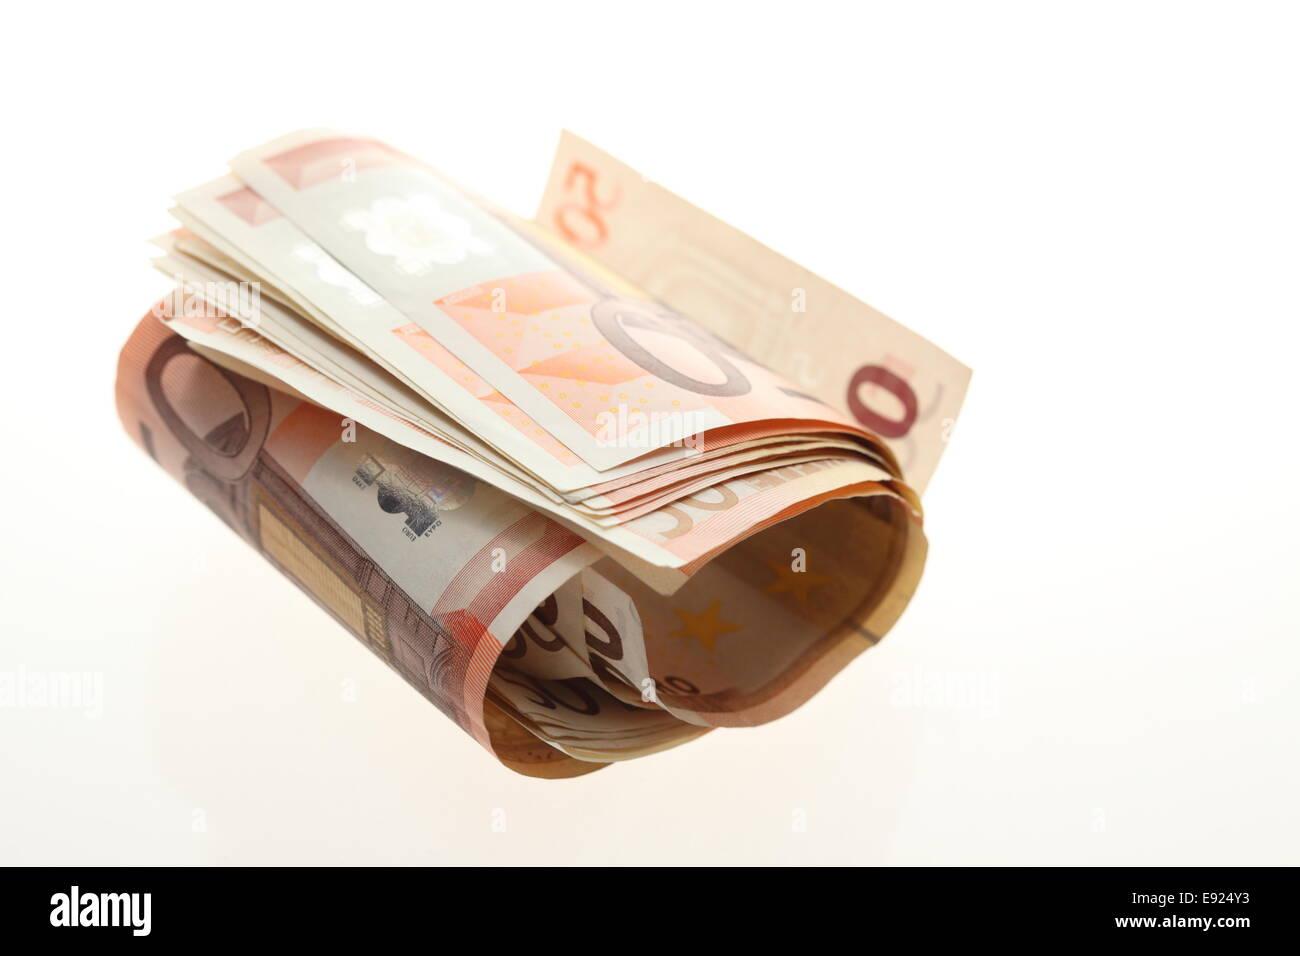 cash - Stock Image